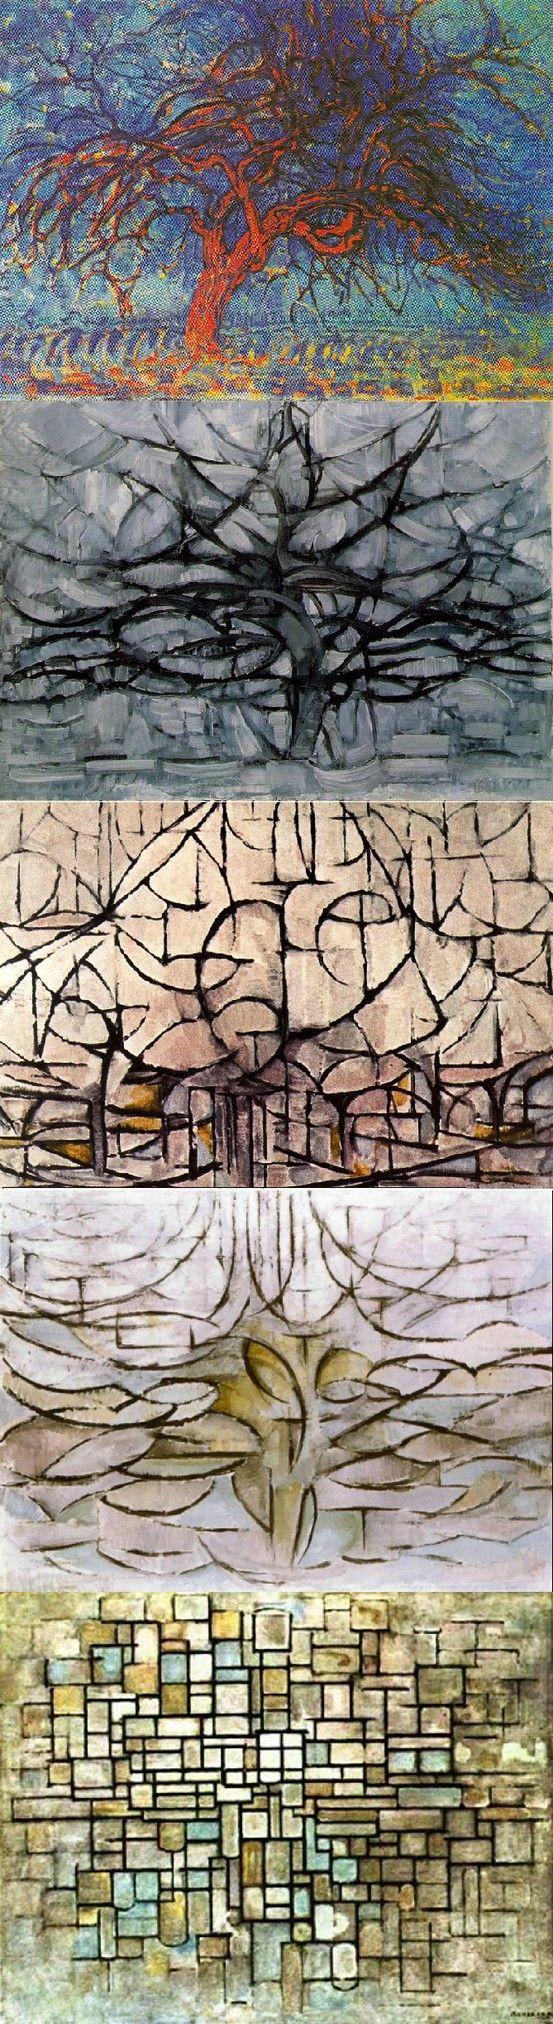 The Apple Tree by Modern Artist Piet Mondrian Counted Cross Stitch Pattern